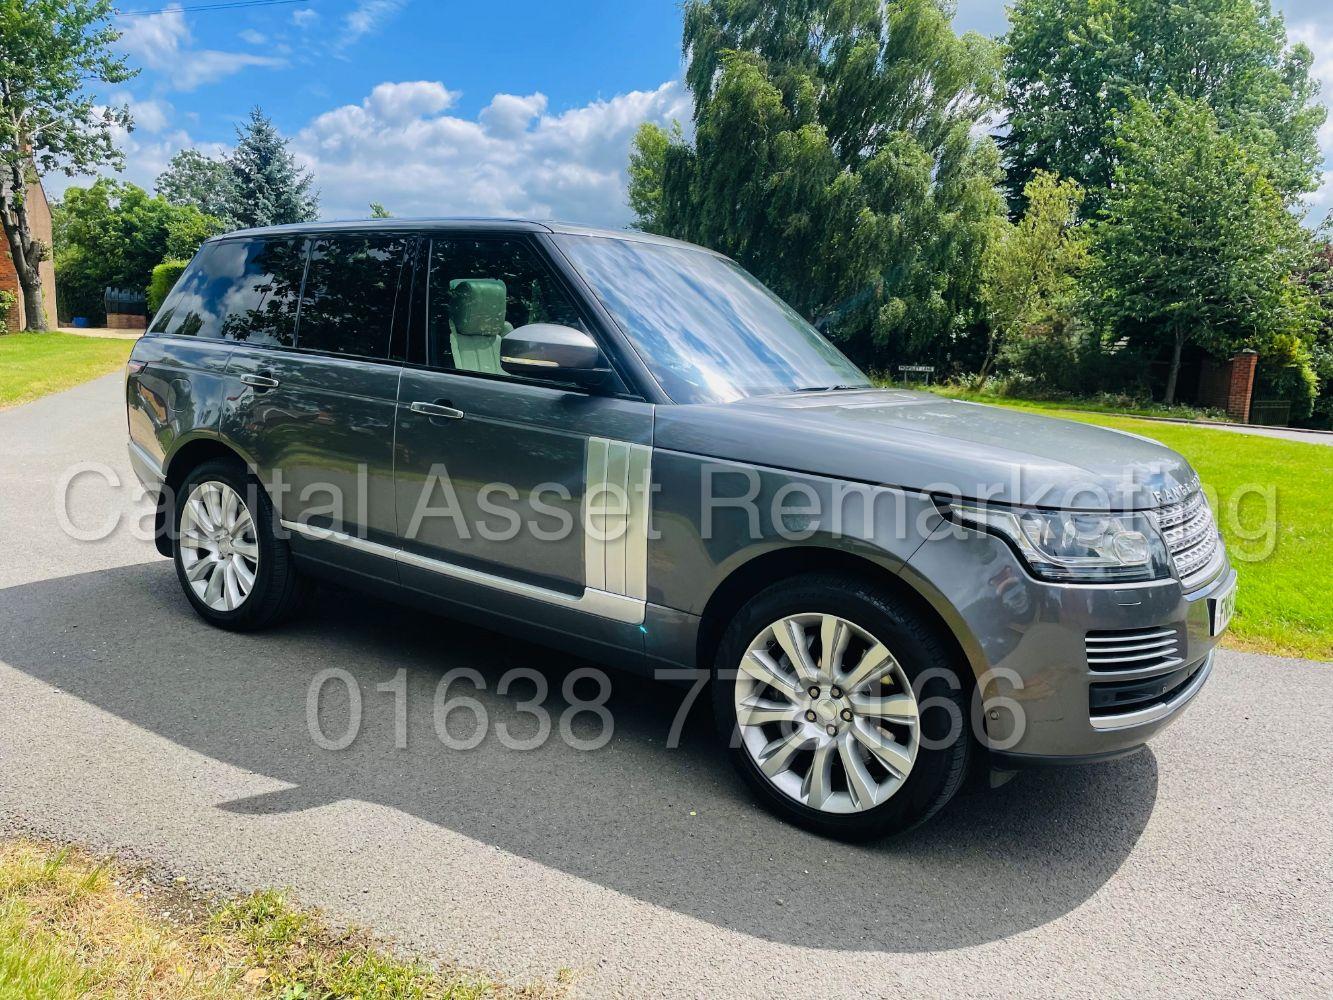 Porsche Cayenne *3.0 V6 Diesel* - Range Rover 4.4 TDV8 *Vogue SE* - 2019 Mercedes-Benz Vito + Many More: Cars, Commercials & 4x4's